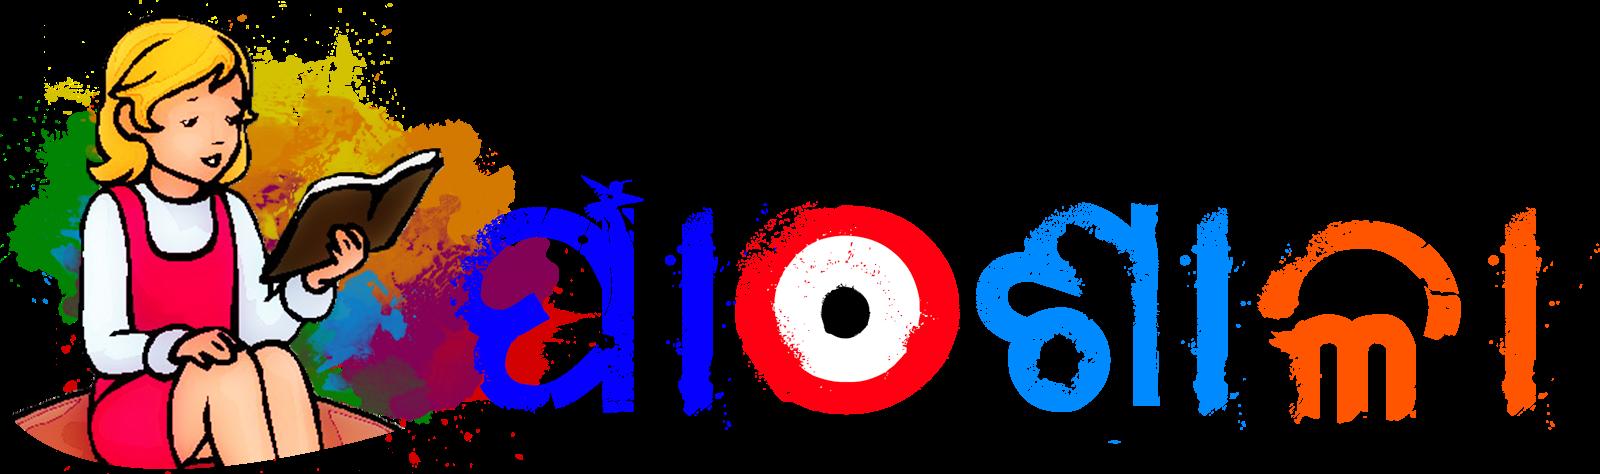 ଓଡ଼ିଆ ପାଠଶାଳା - Online Odia Education Hub By OdiaPortal.IN